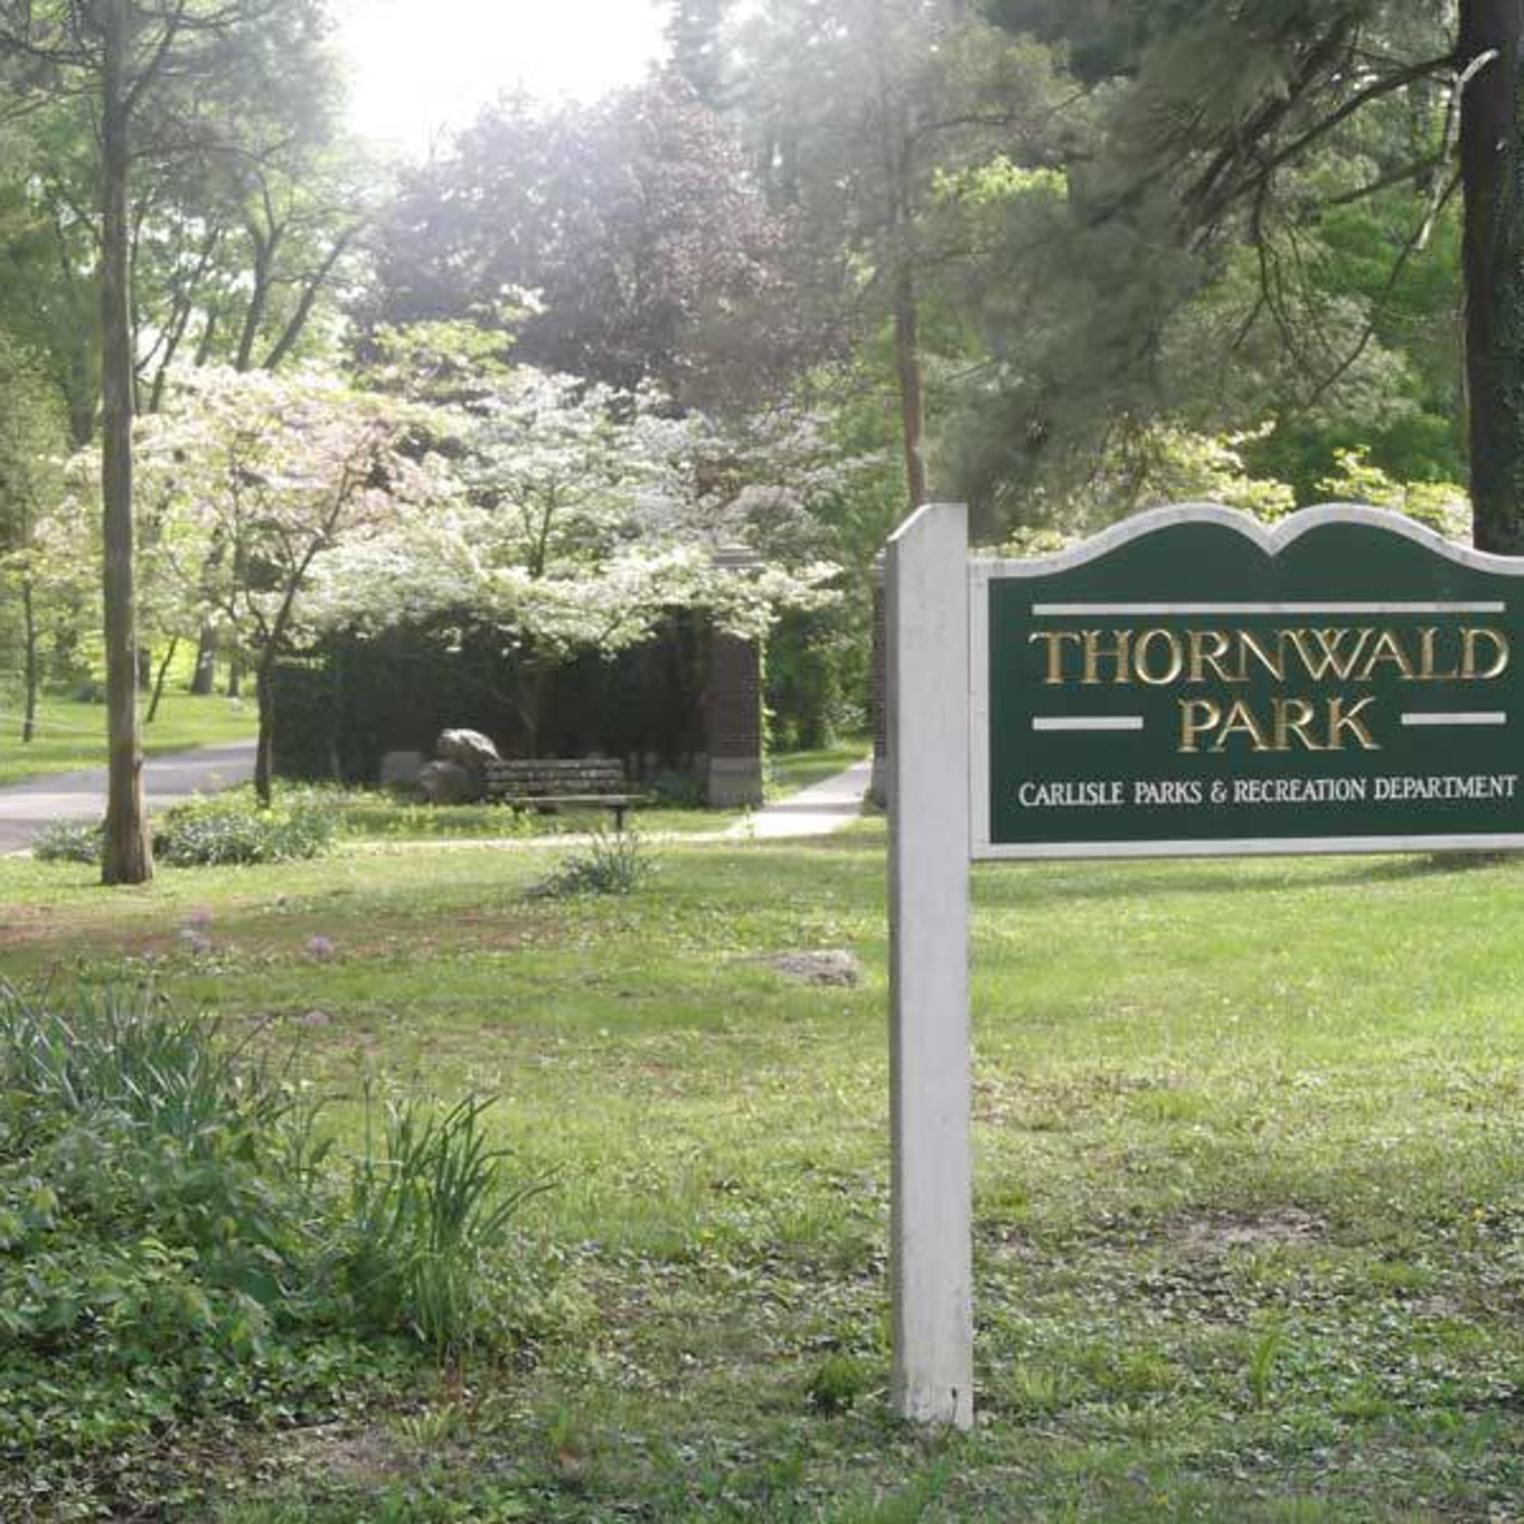 Thornwald Park